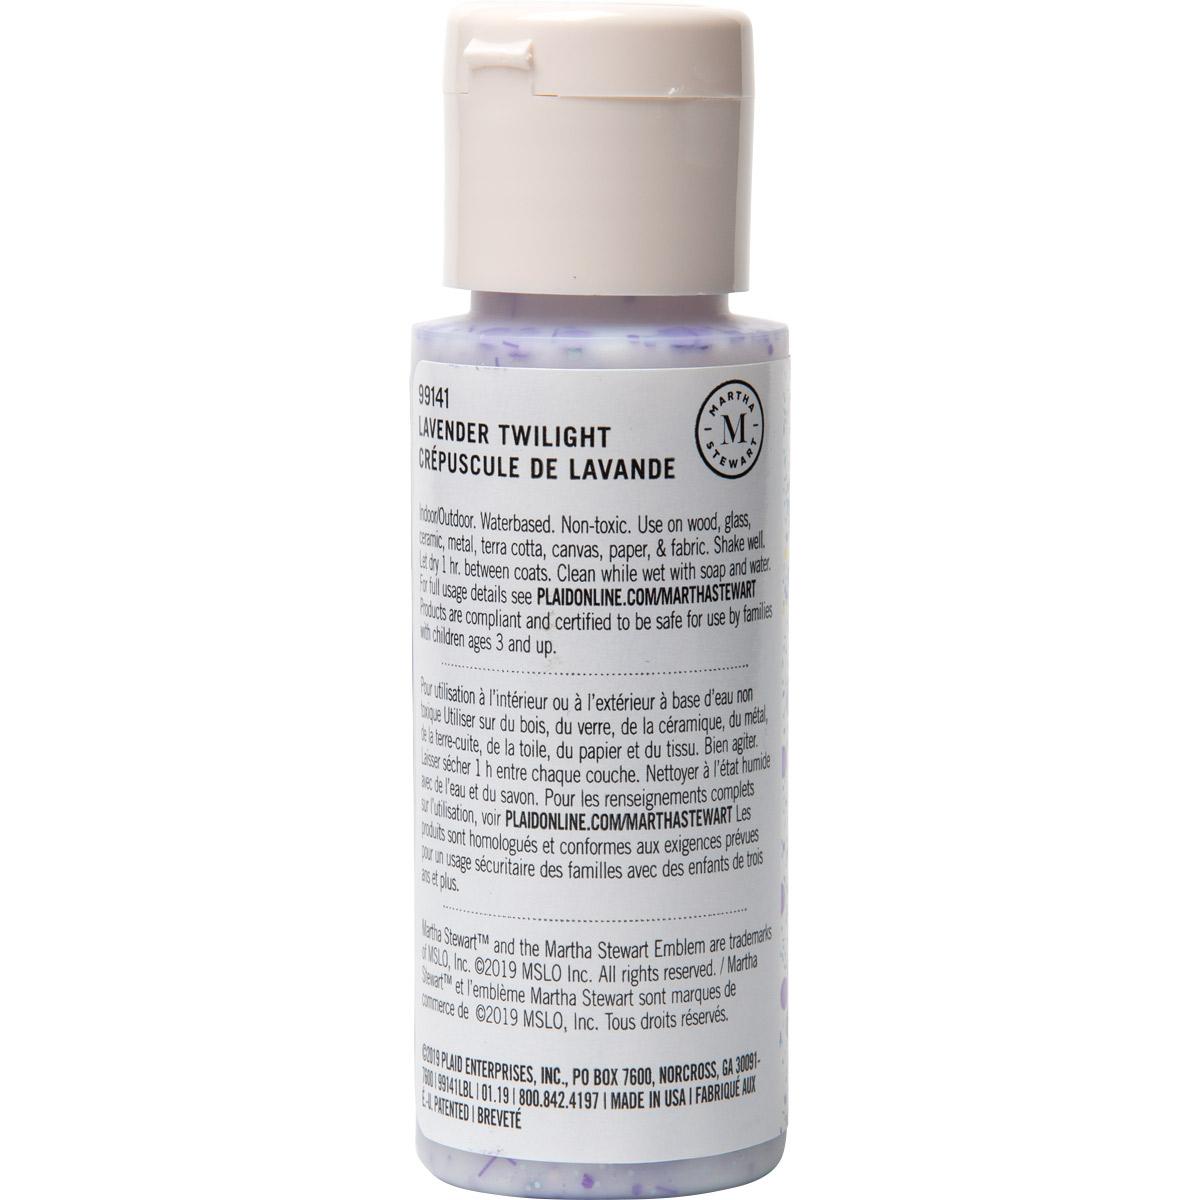 Martha Stewart ® Multi-Surface Confetti Glitter Acrylic Craft Paint CPSIA - Lavender Twilight, 2 oz.